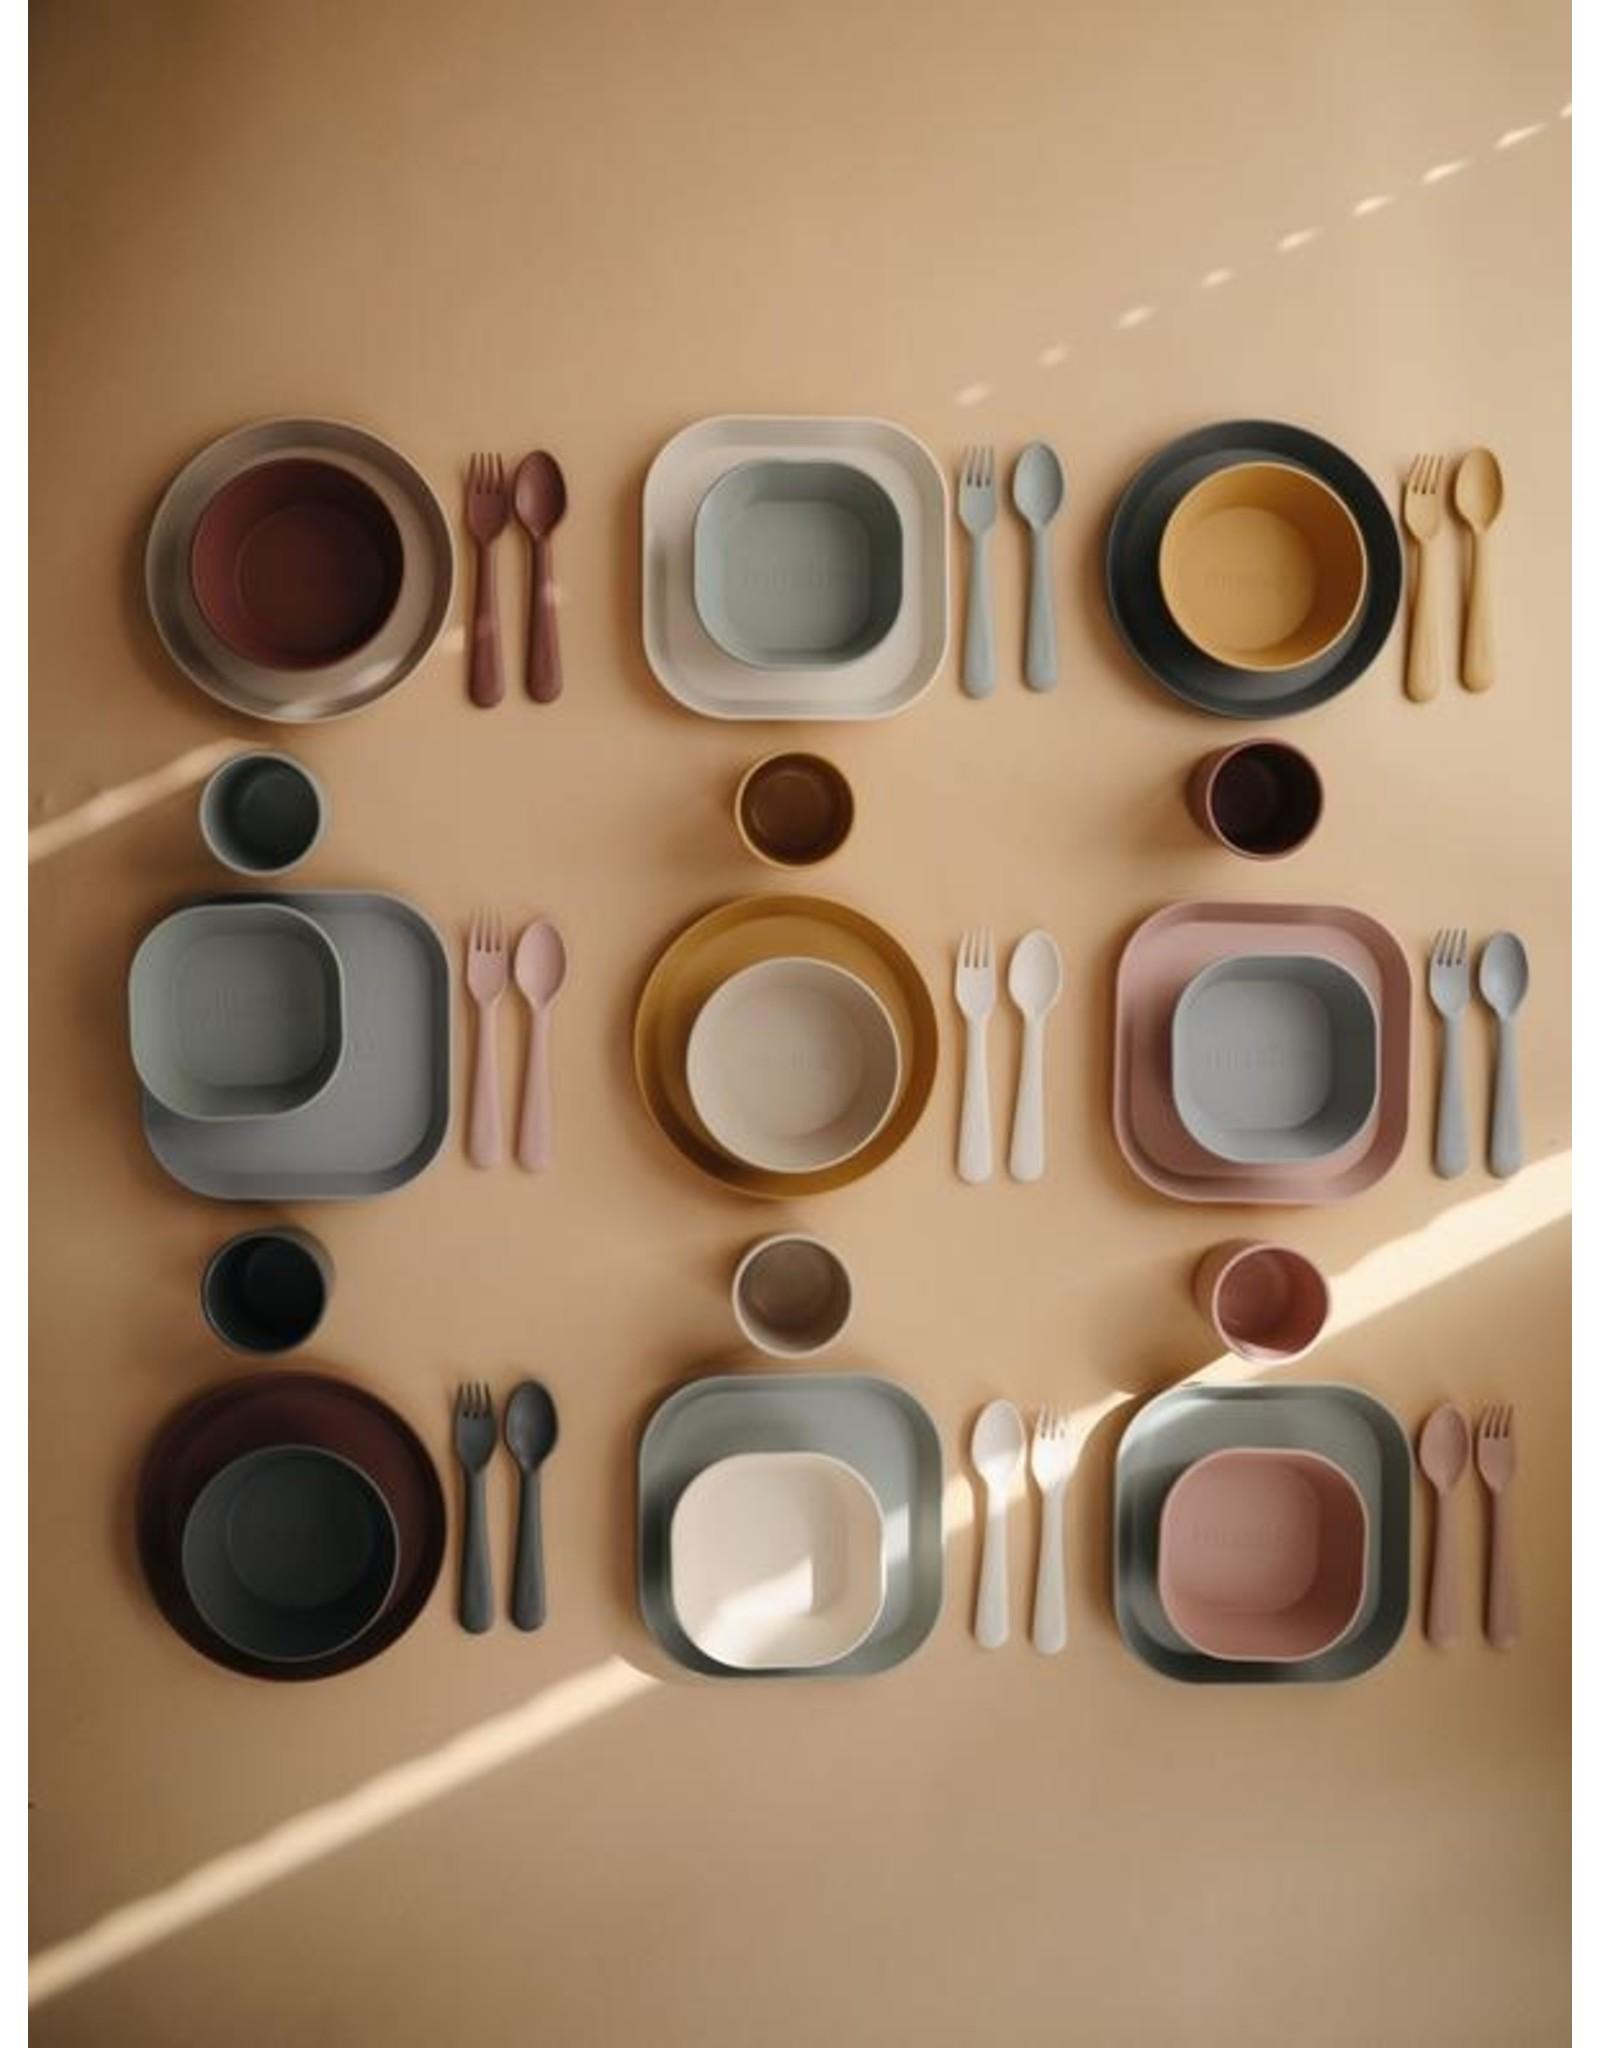 Mushie Couverts Fourchette / Cuillère - Sage